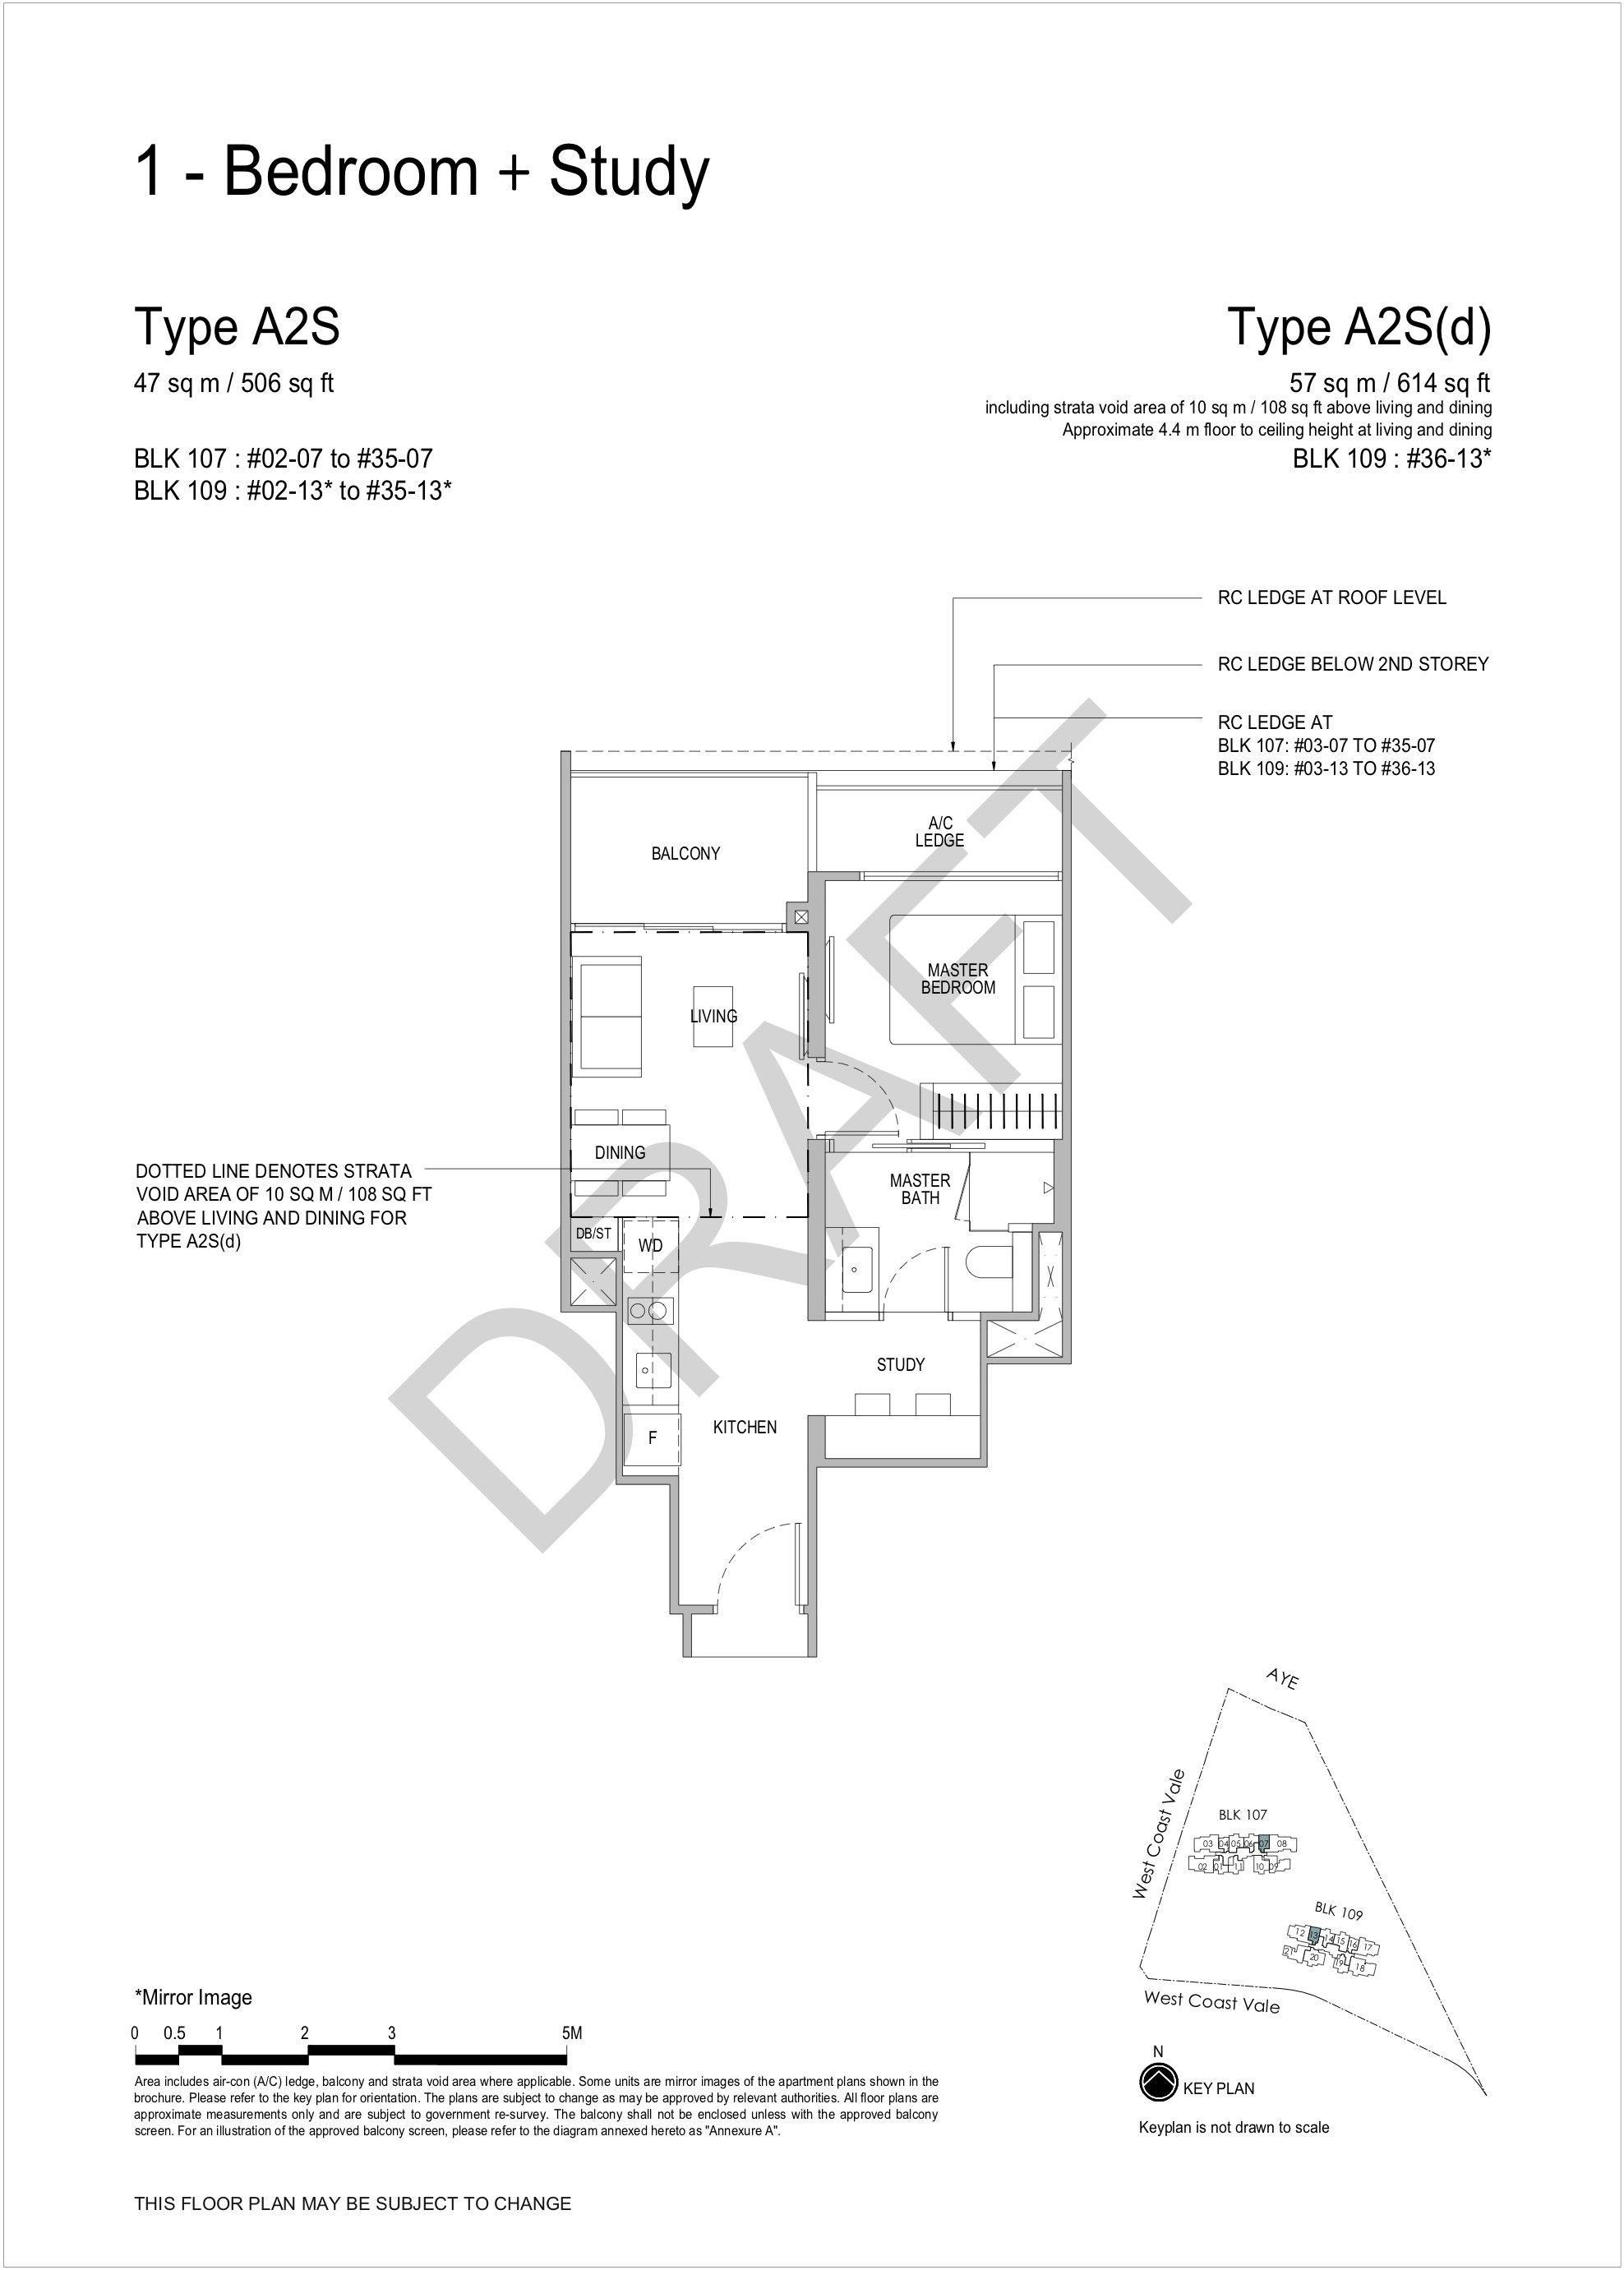 Whistler Grand 1 bedroom + study floor plan A2S